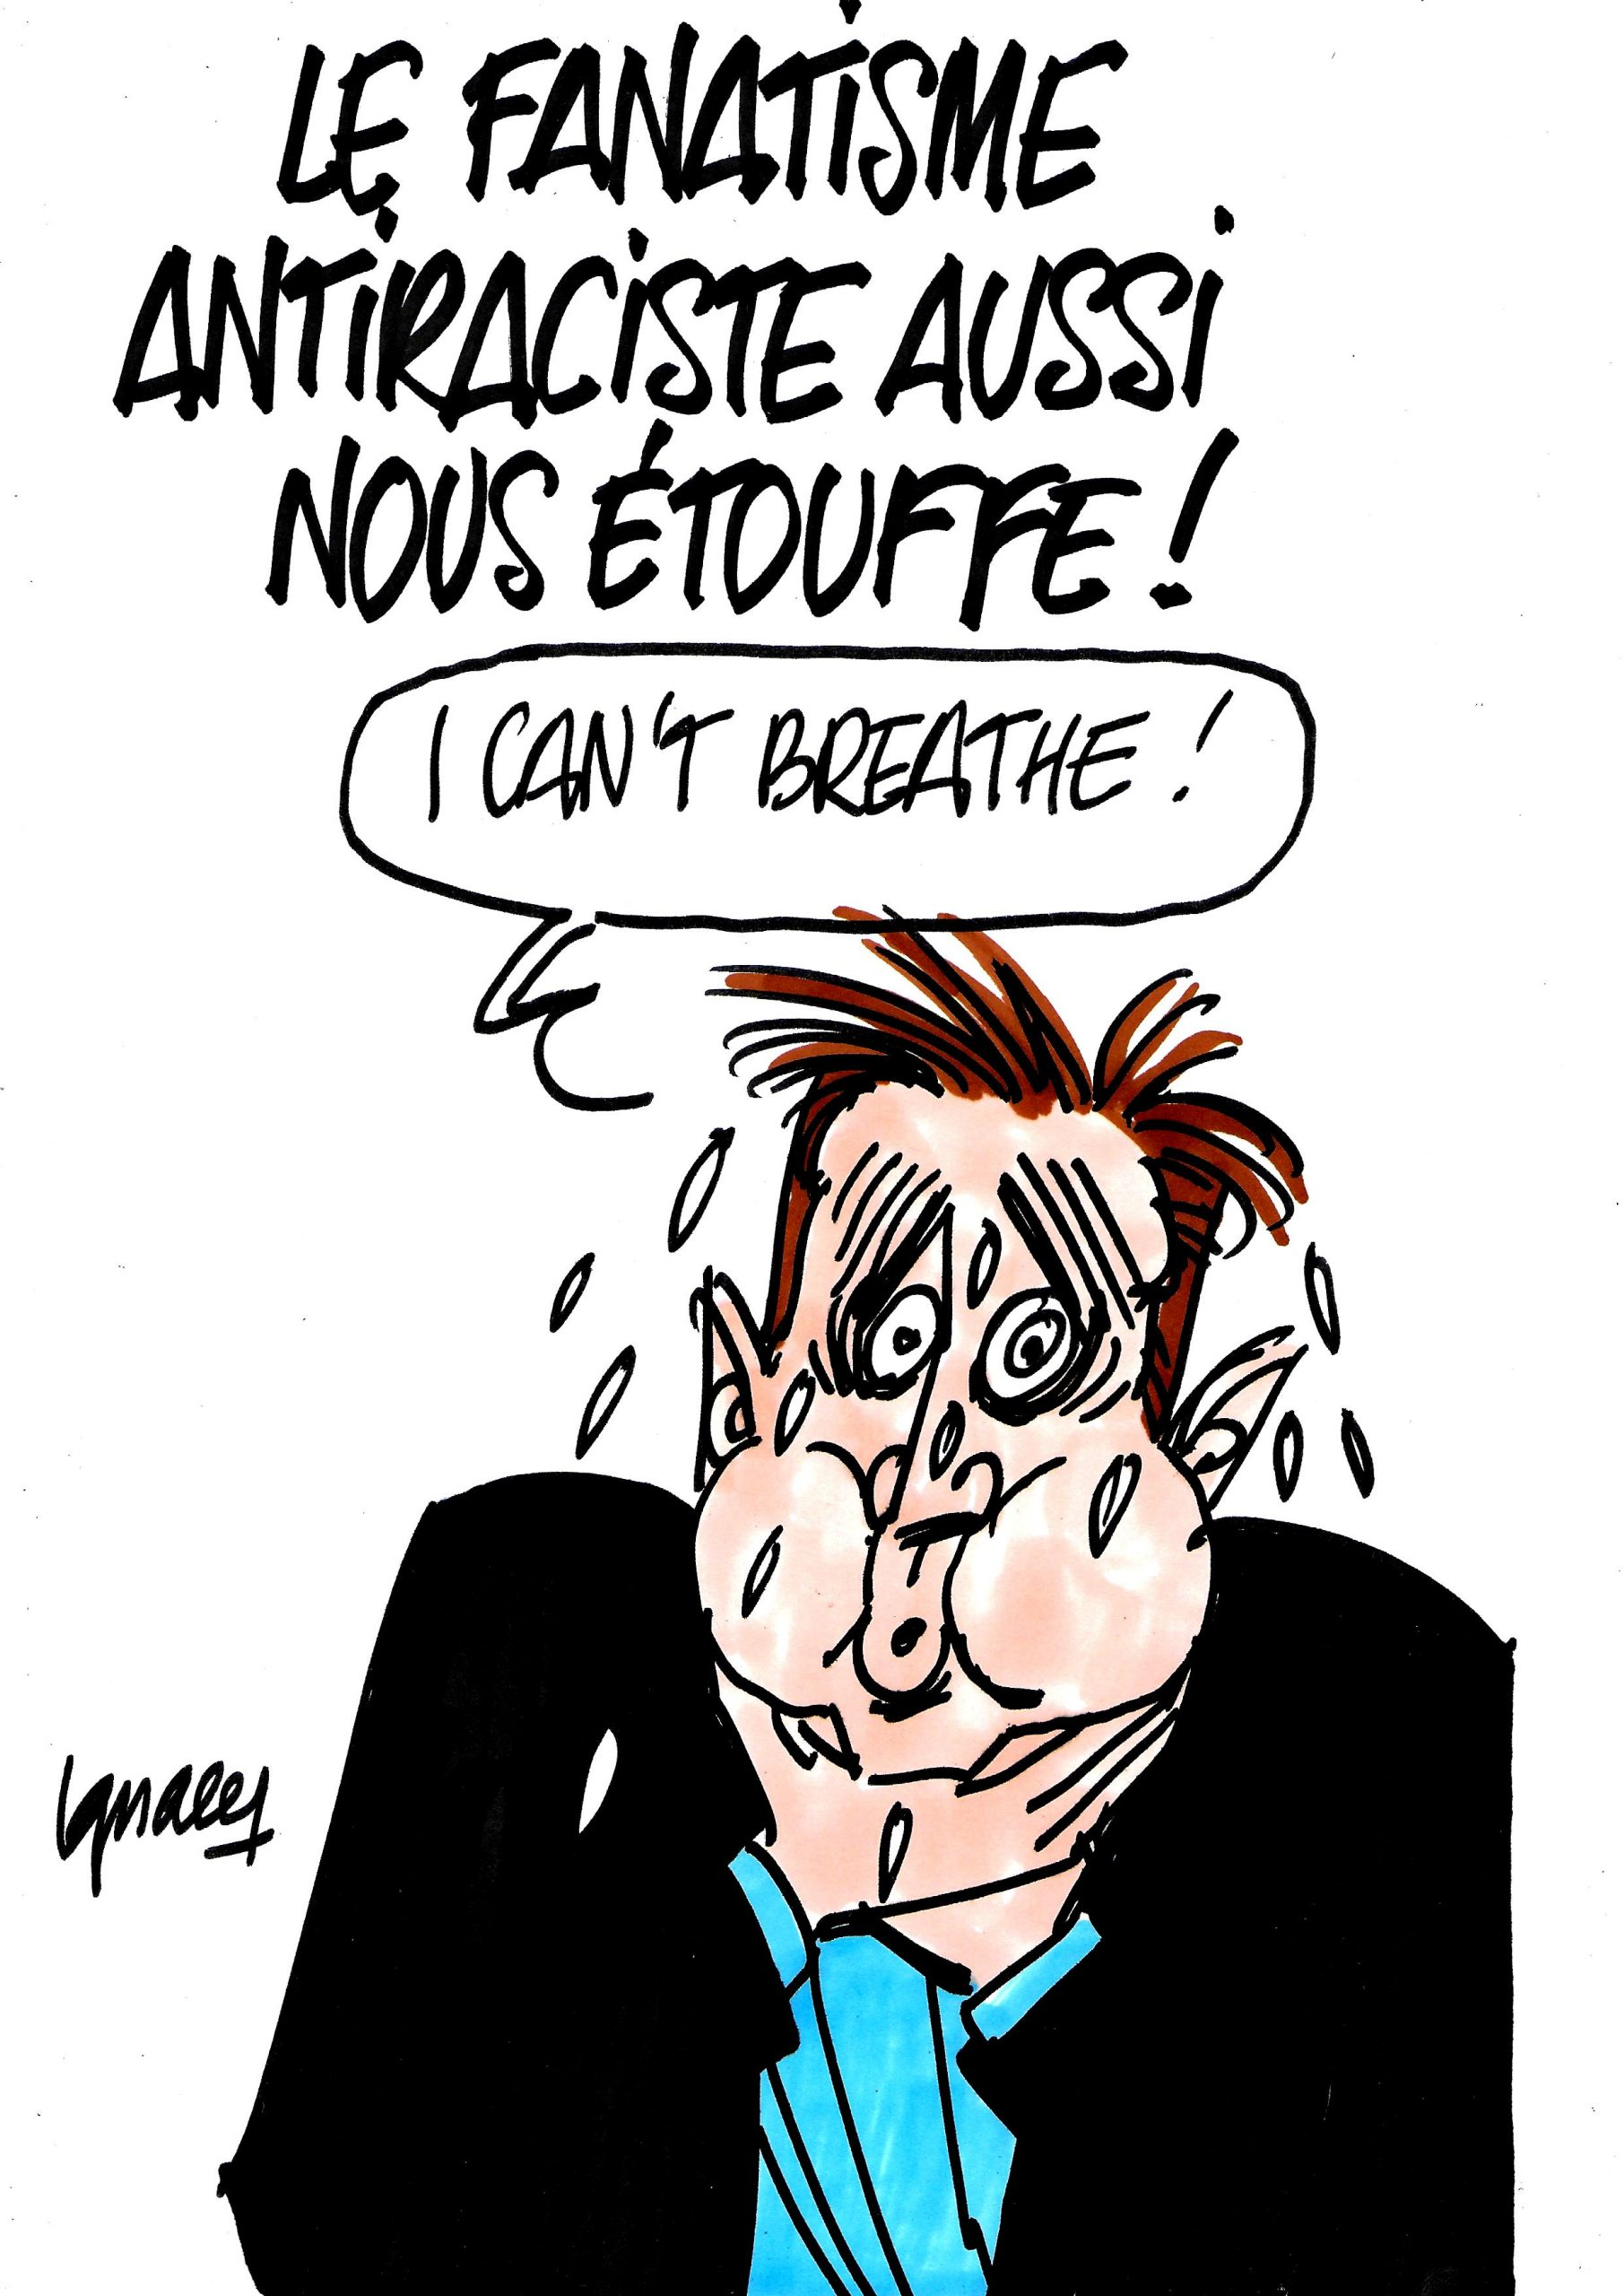 Ignace - Le fanatisme antiraciste aussi nous étouffe !